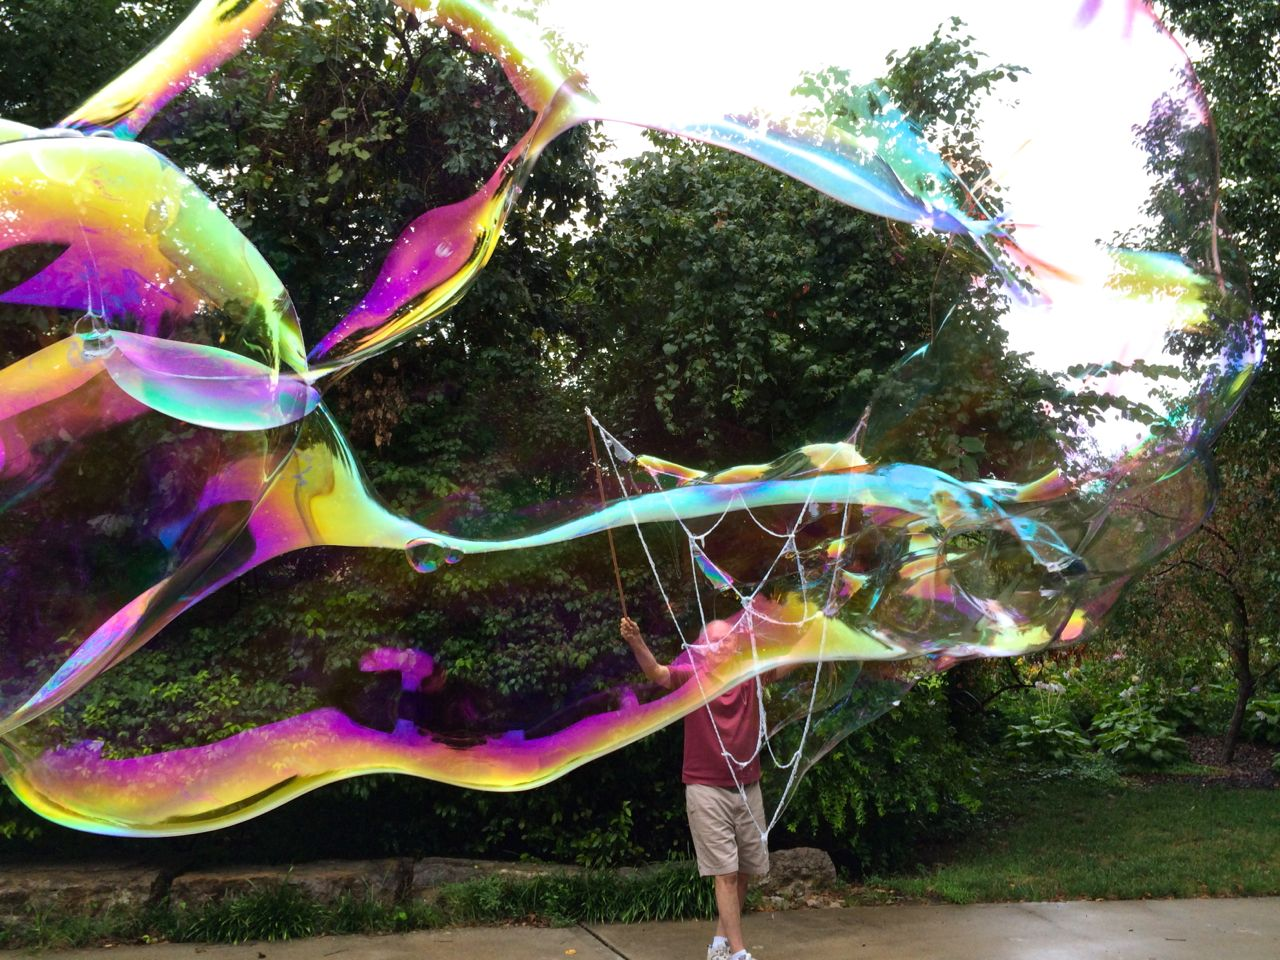 Bubble Time after rain, Kansas